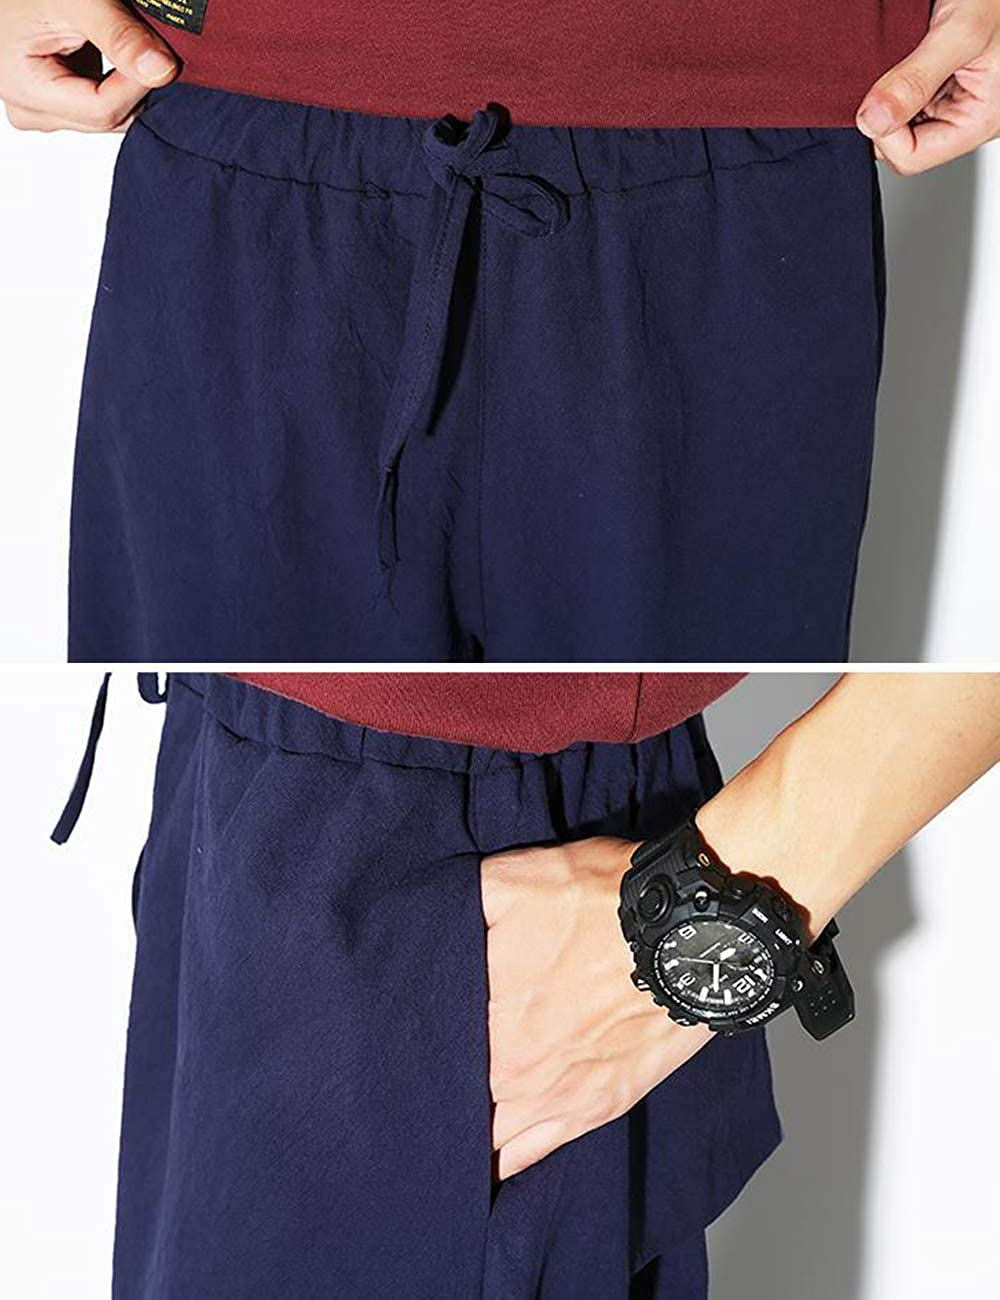 besbomig Linen Baggy Boho Hip Hop Trousers Mens Workout Leggings Casual Pants